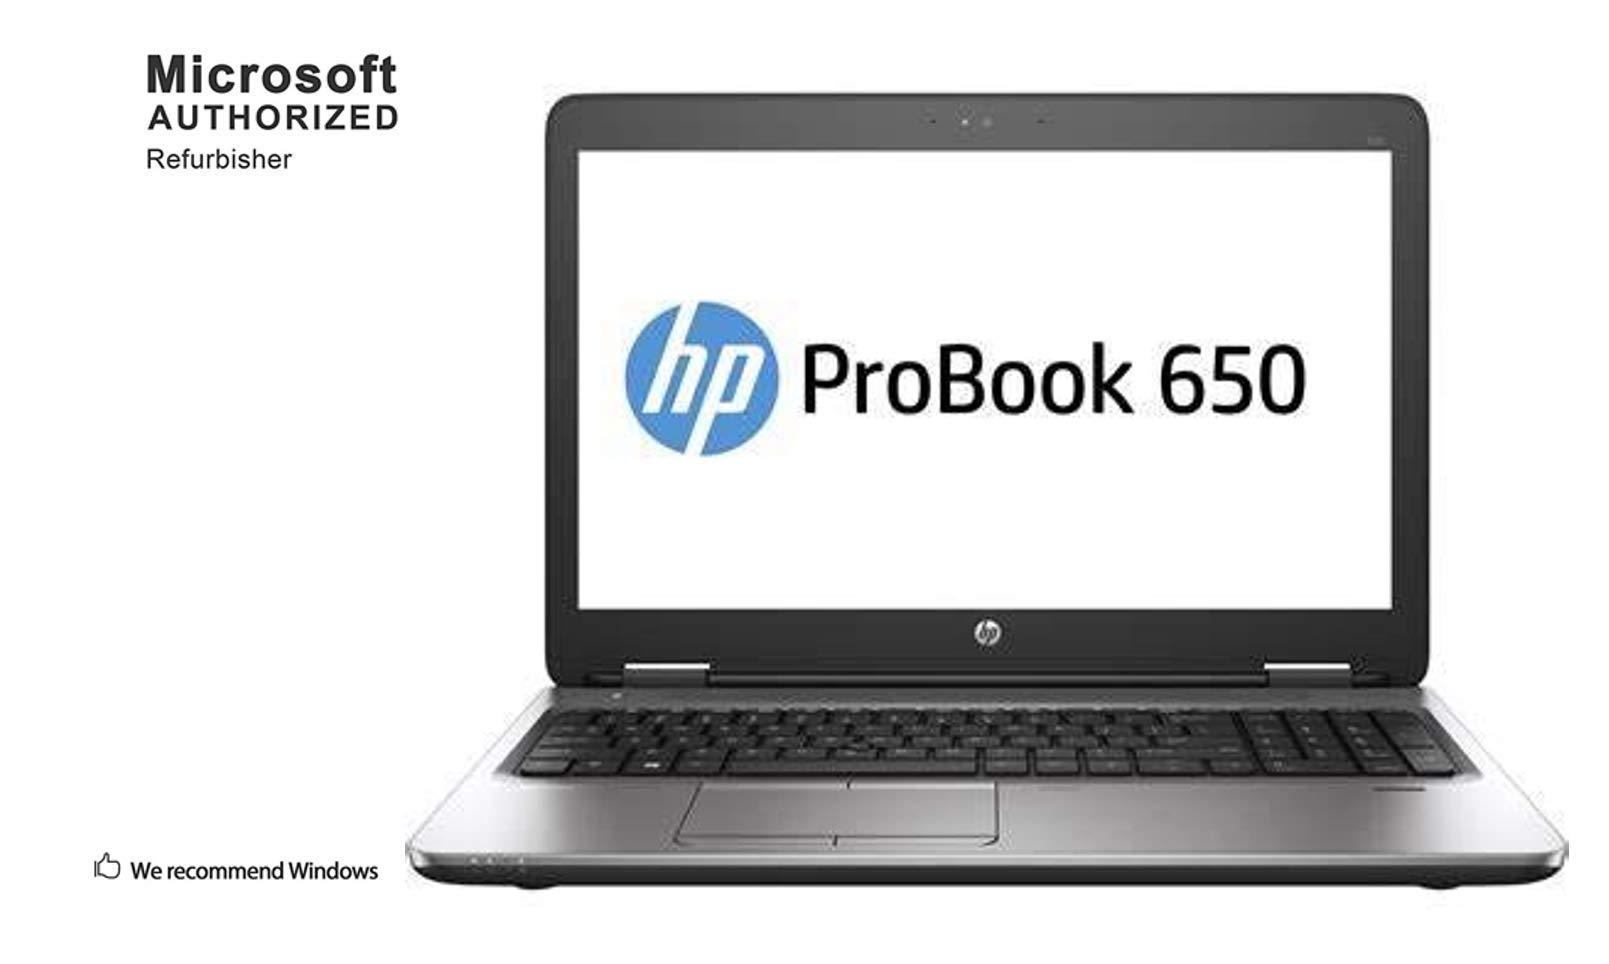 HP ProBook 650 G2 15.6 Inch Business Laptop PC, Intel Core i5 6300U up to 3.0GHz, 16 GB DDR4, 512 GB SSD, WiFi, DVD, VGA, DP, Win 10 Pro 64 Bit-Multi-Language Supports English/Spanish/French(Renewed)...